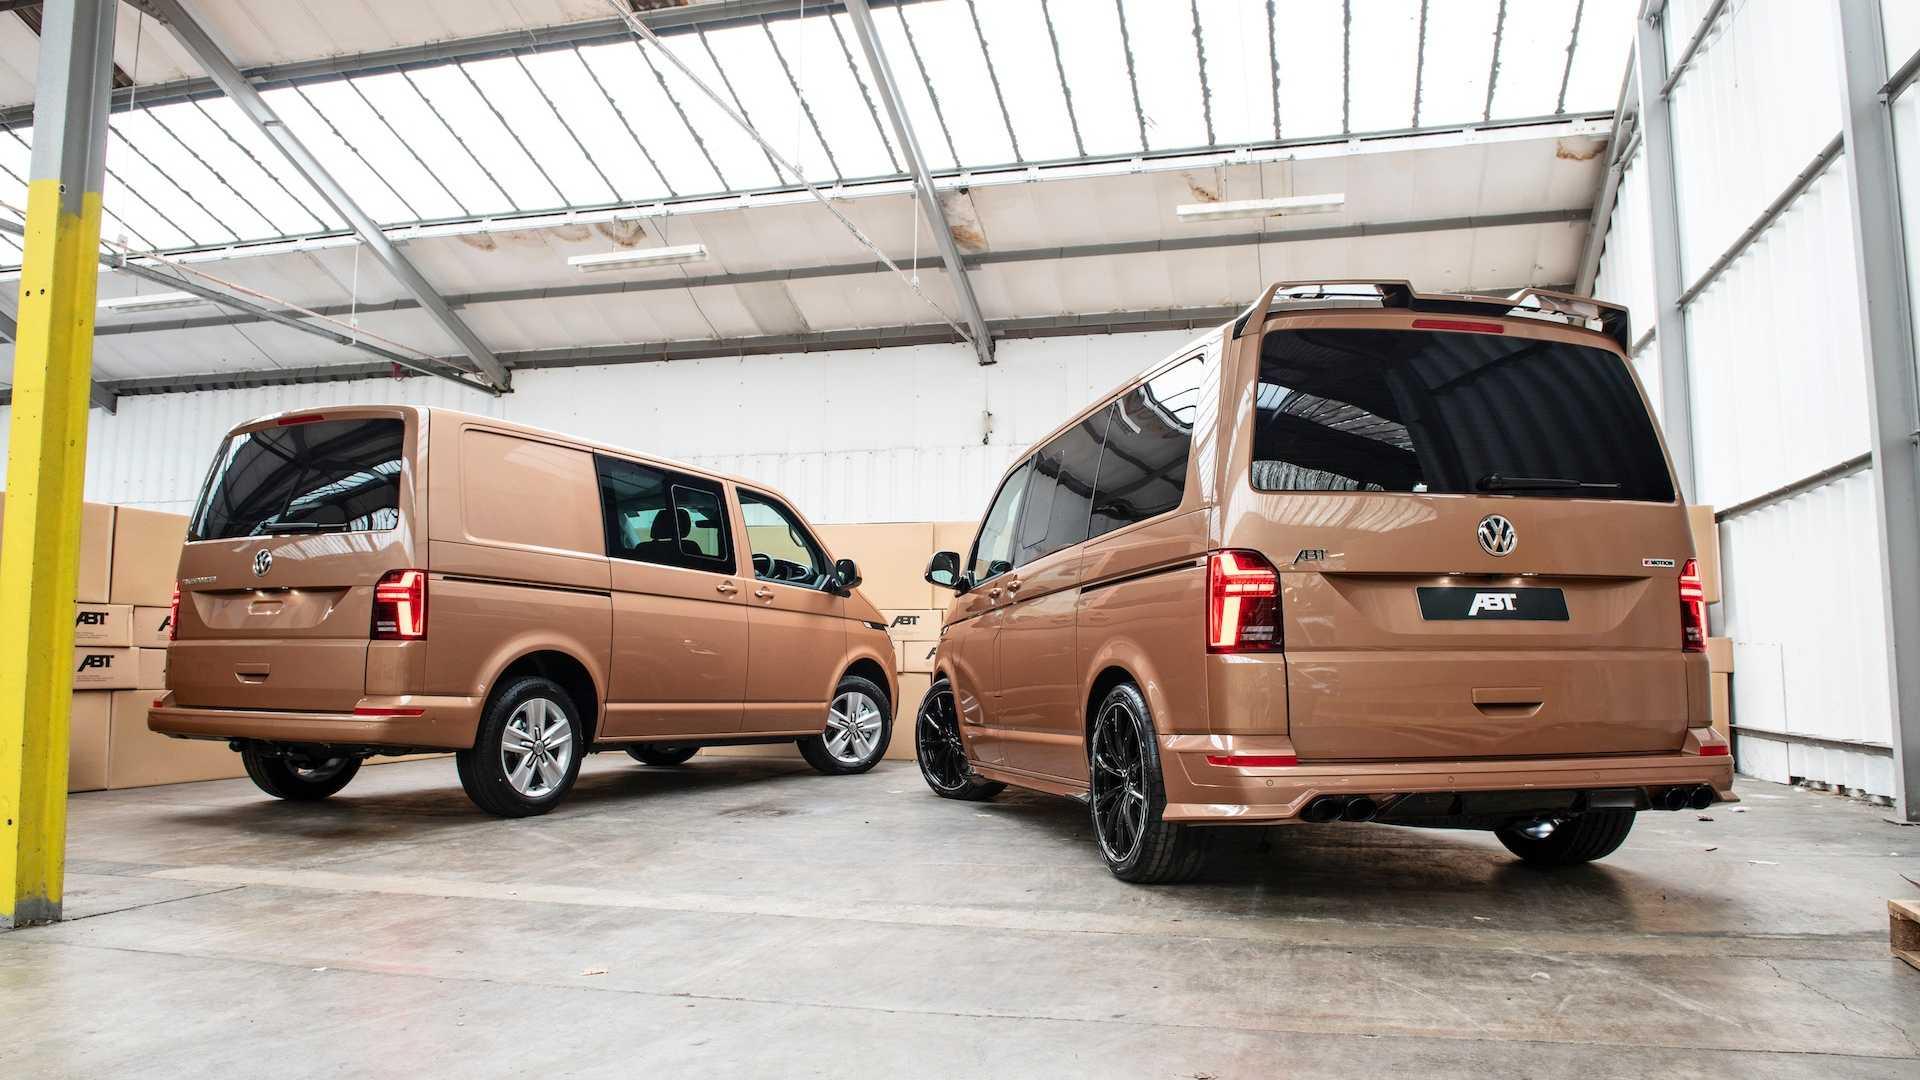 VW-Transporter-by-ABT-4